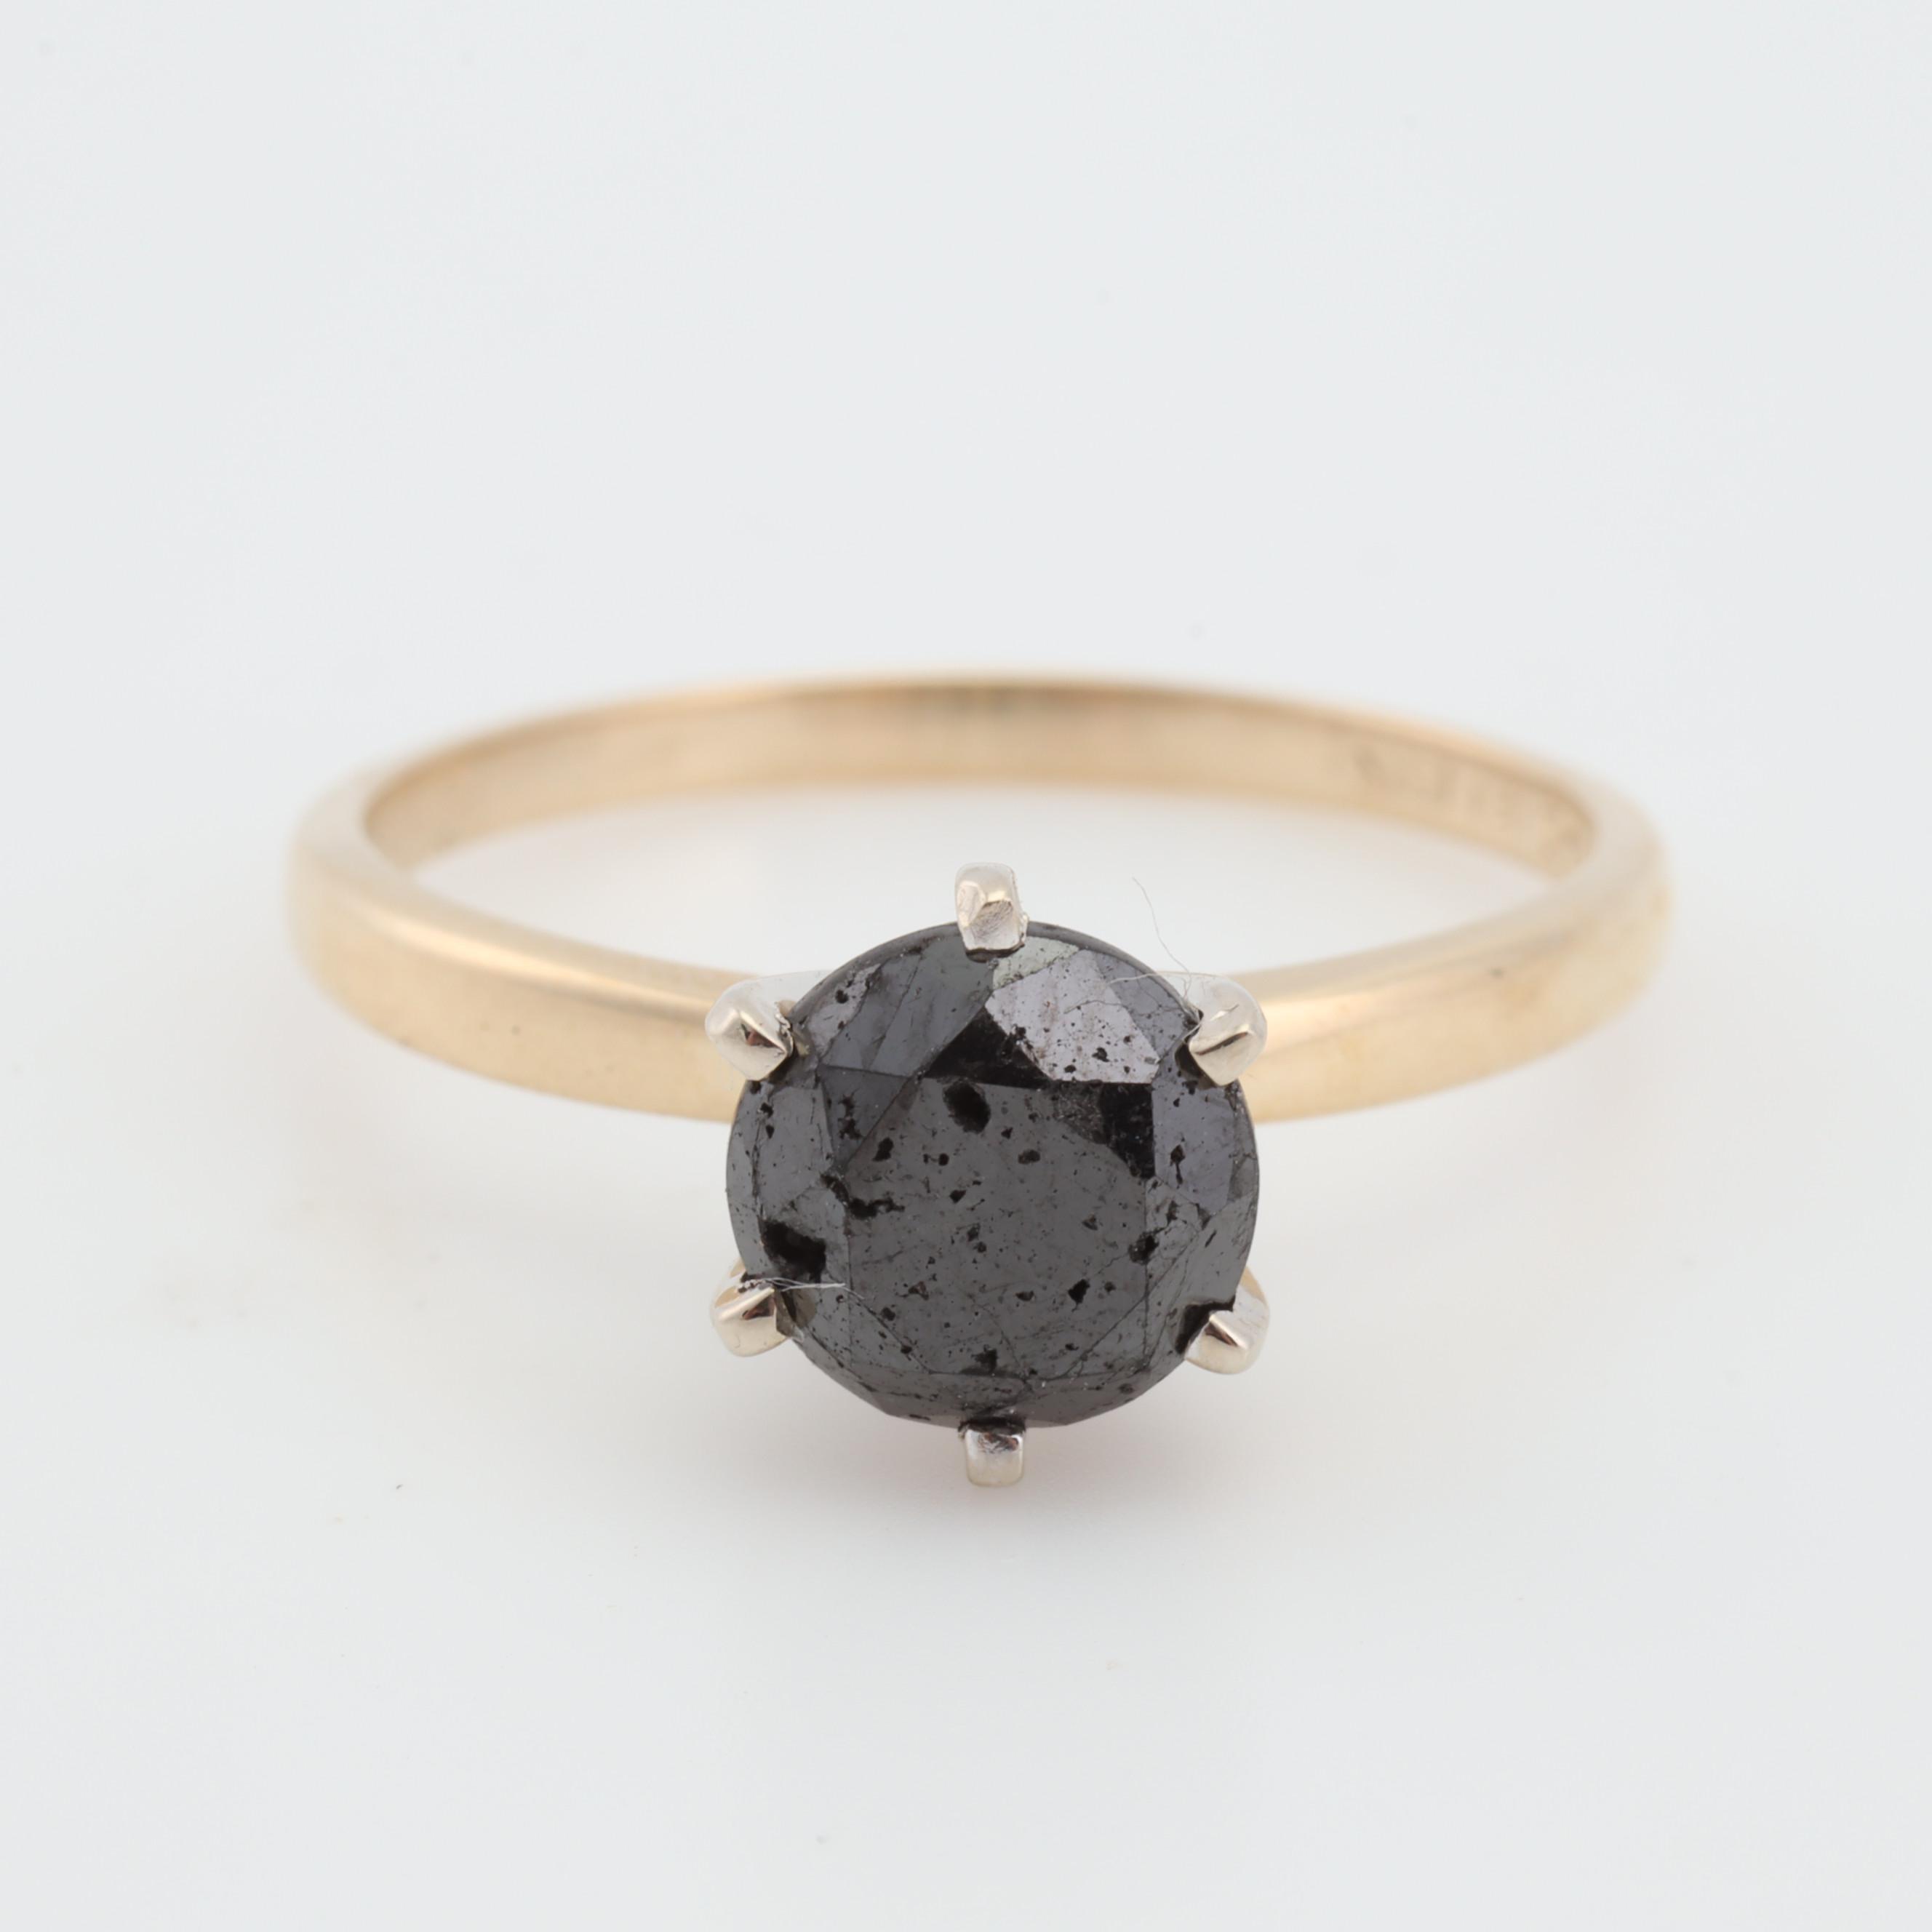 14K White Gold Black Diamond Solitaire Ring, 1.32 CT